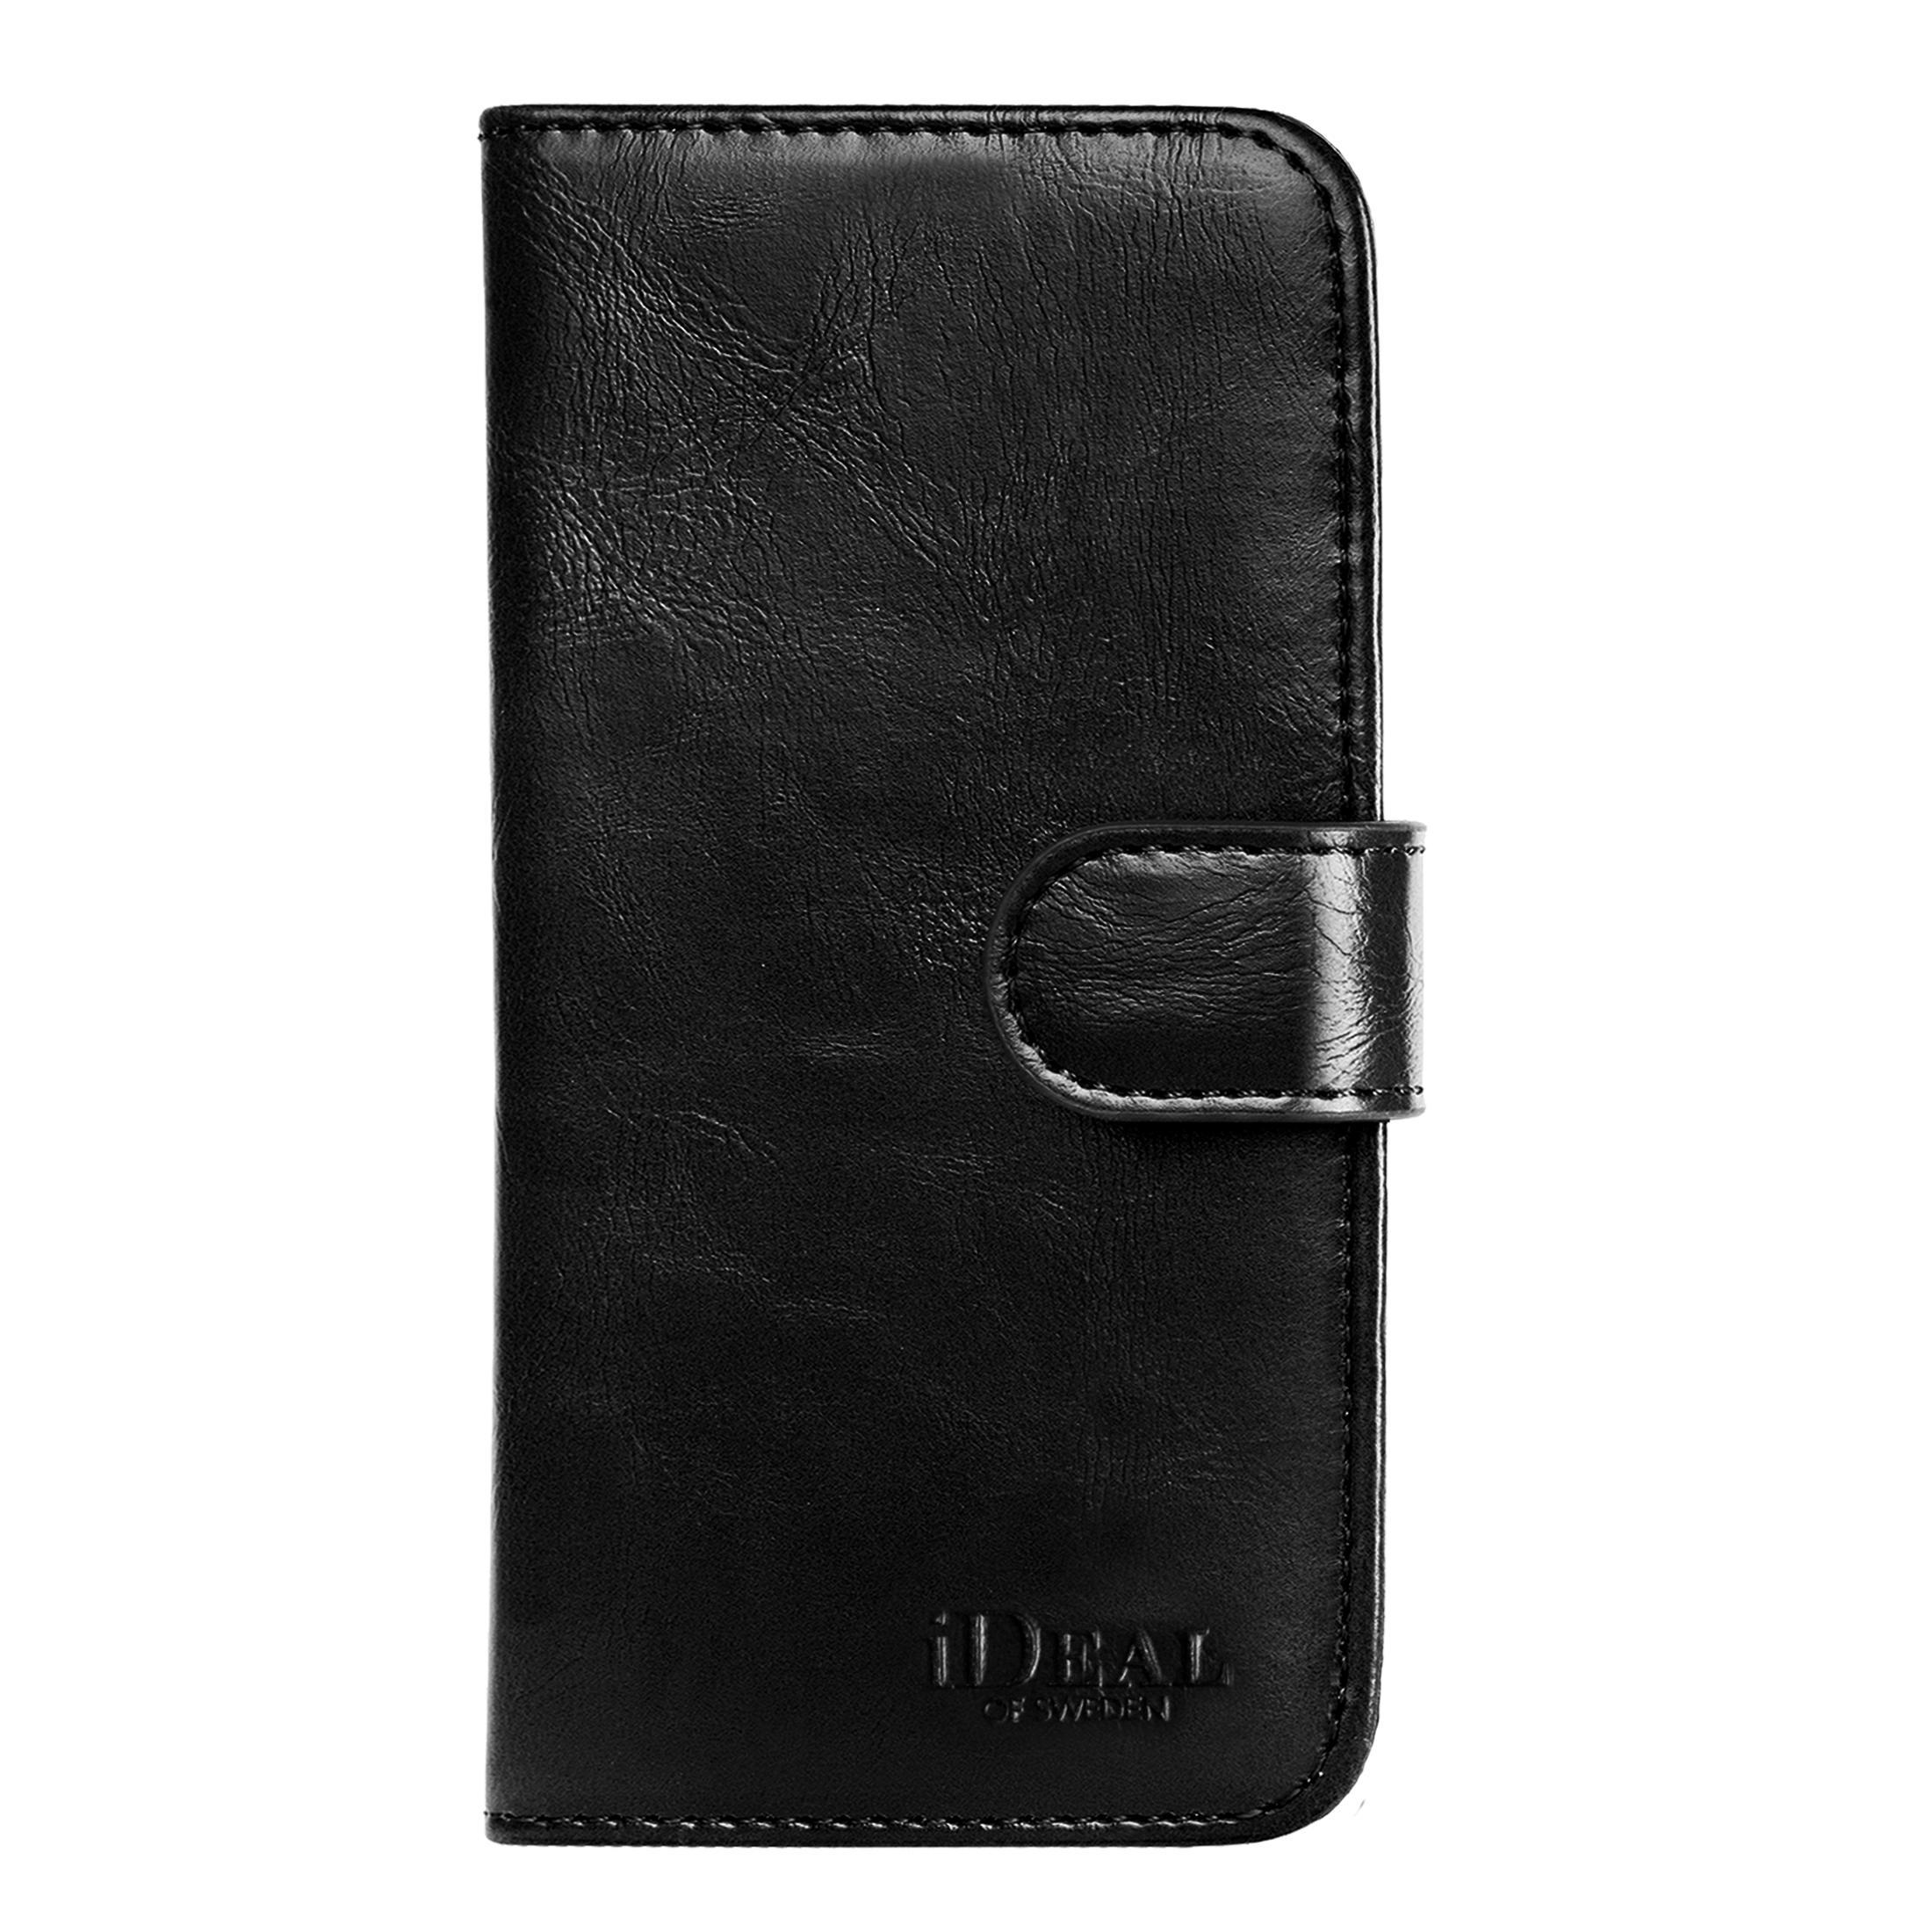 Magnet Wallet+ iPhone 11 Pro Max Black